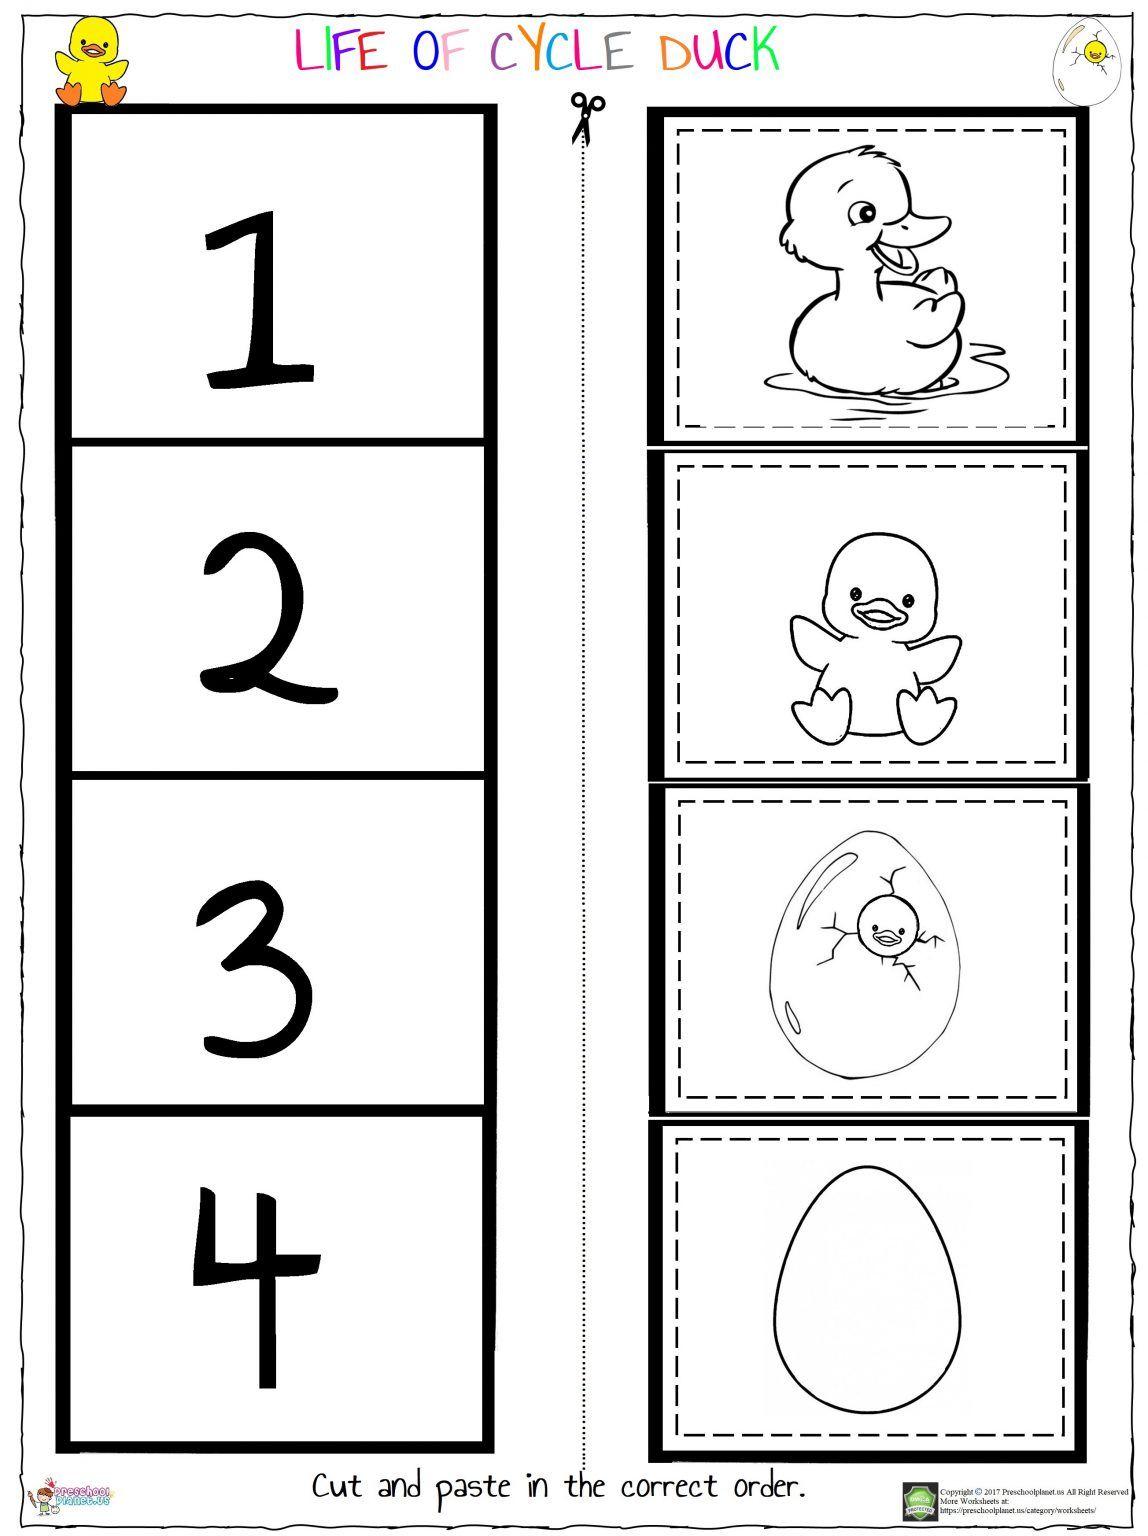 Life Of Cycle Duck Worksheet Preschoolplanet In